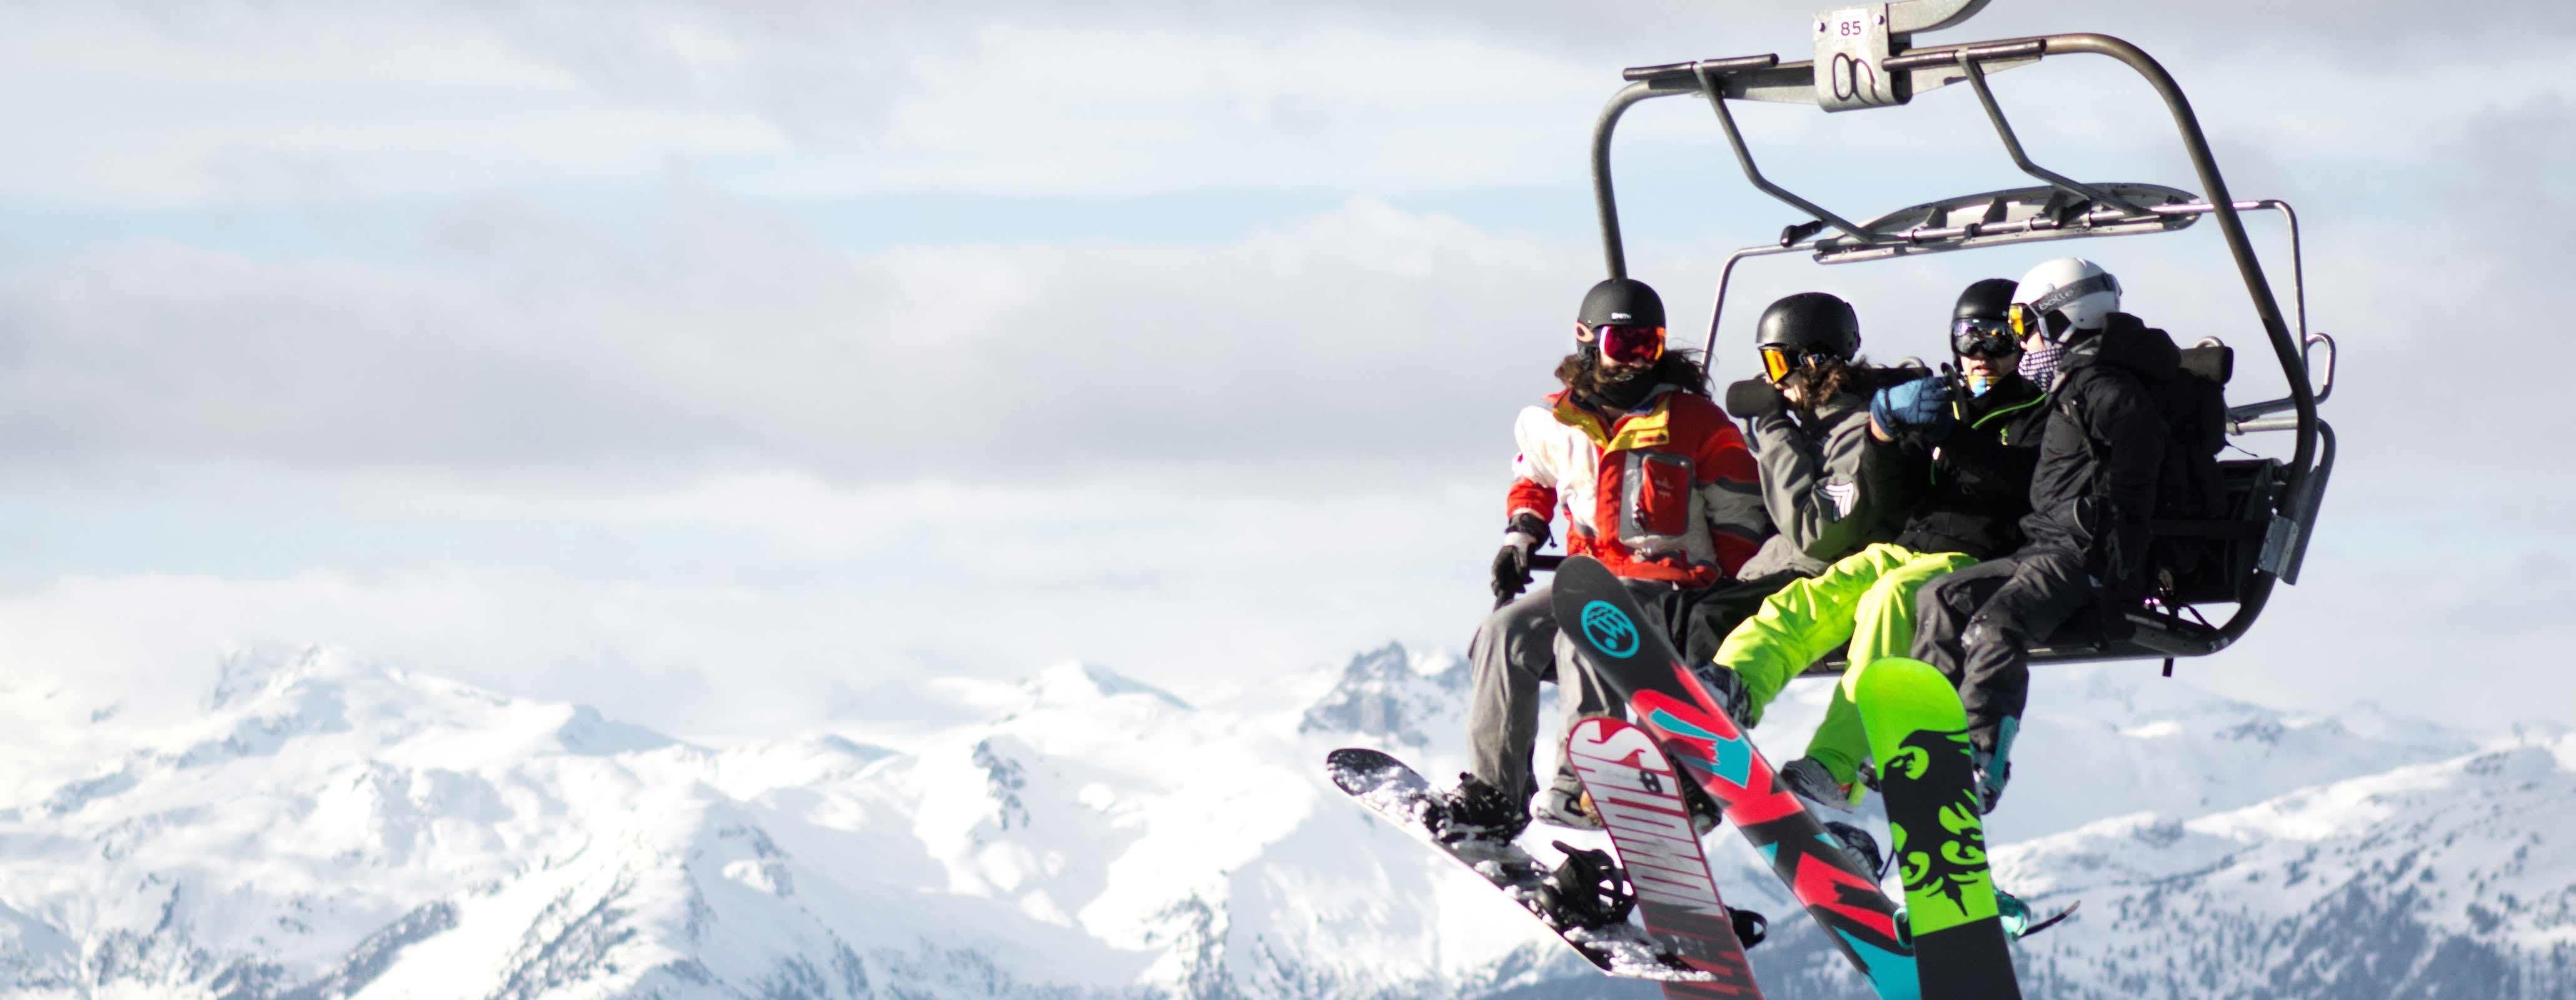 Mensen in de skilift